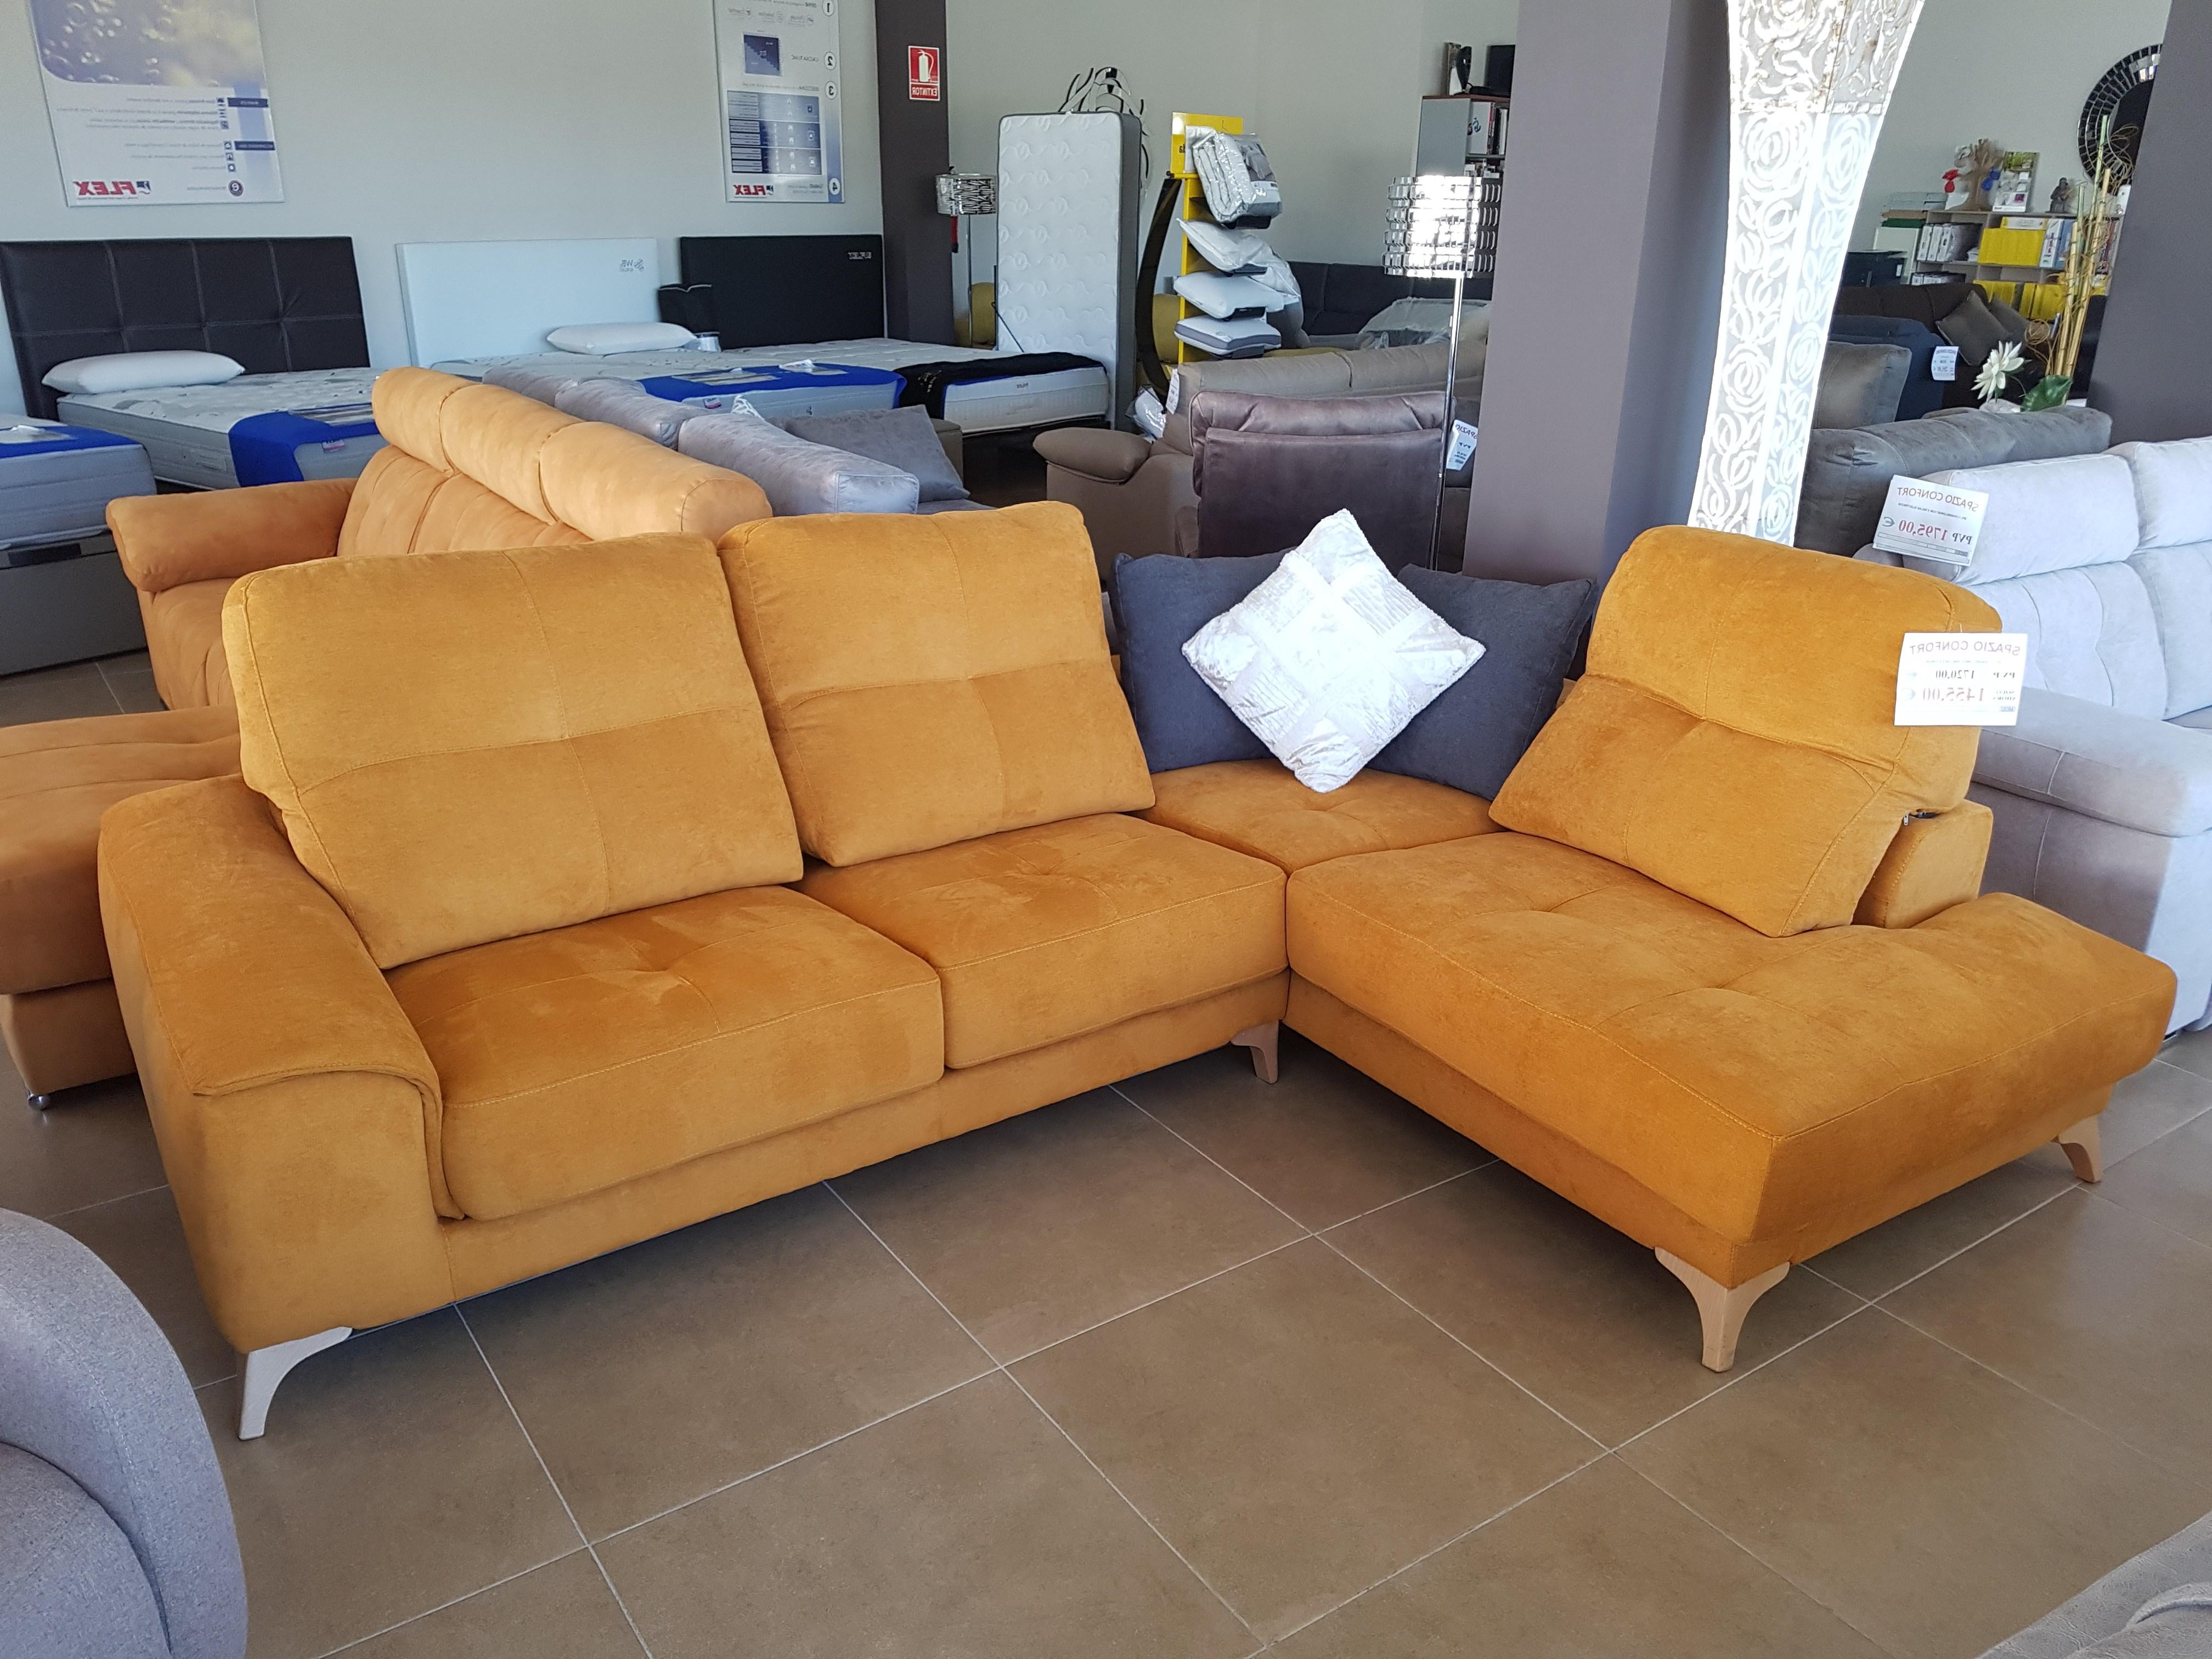 Sofas Baratos Granada Gdd0 sofas Muebles Boom Tiendas De Muebles Sabadell Affordable Best